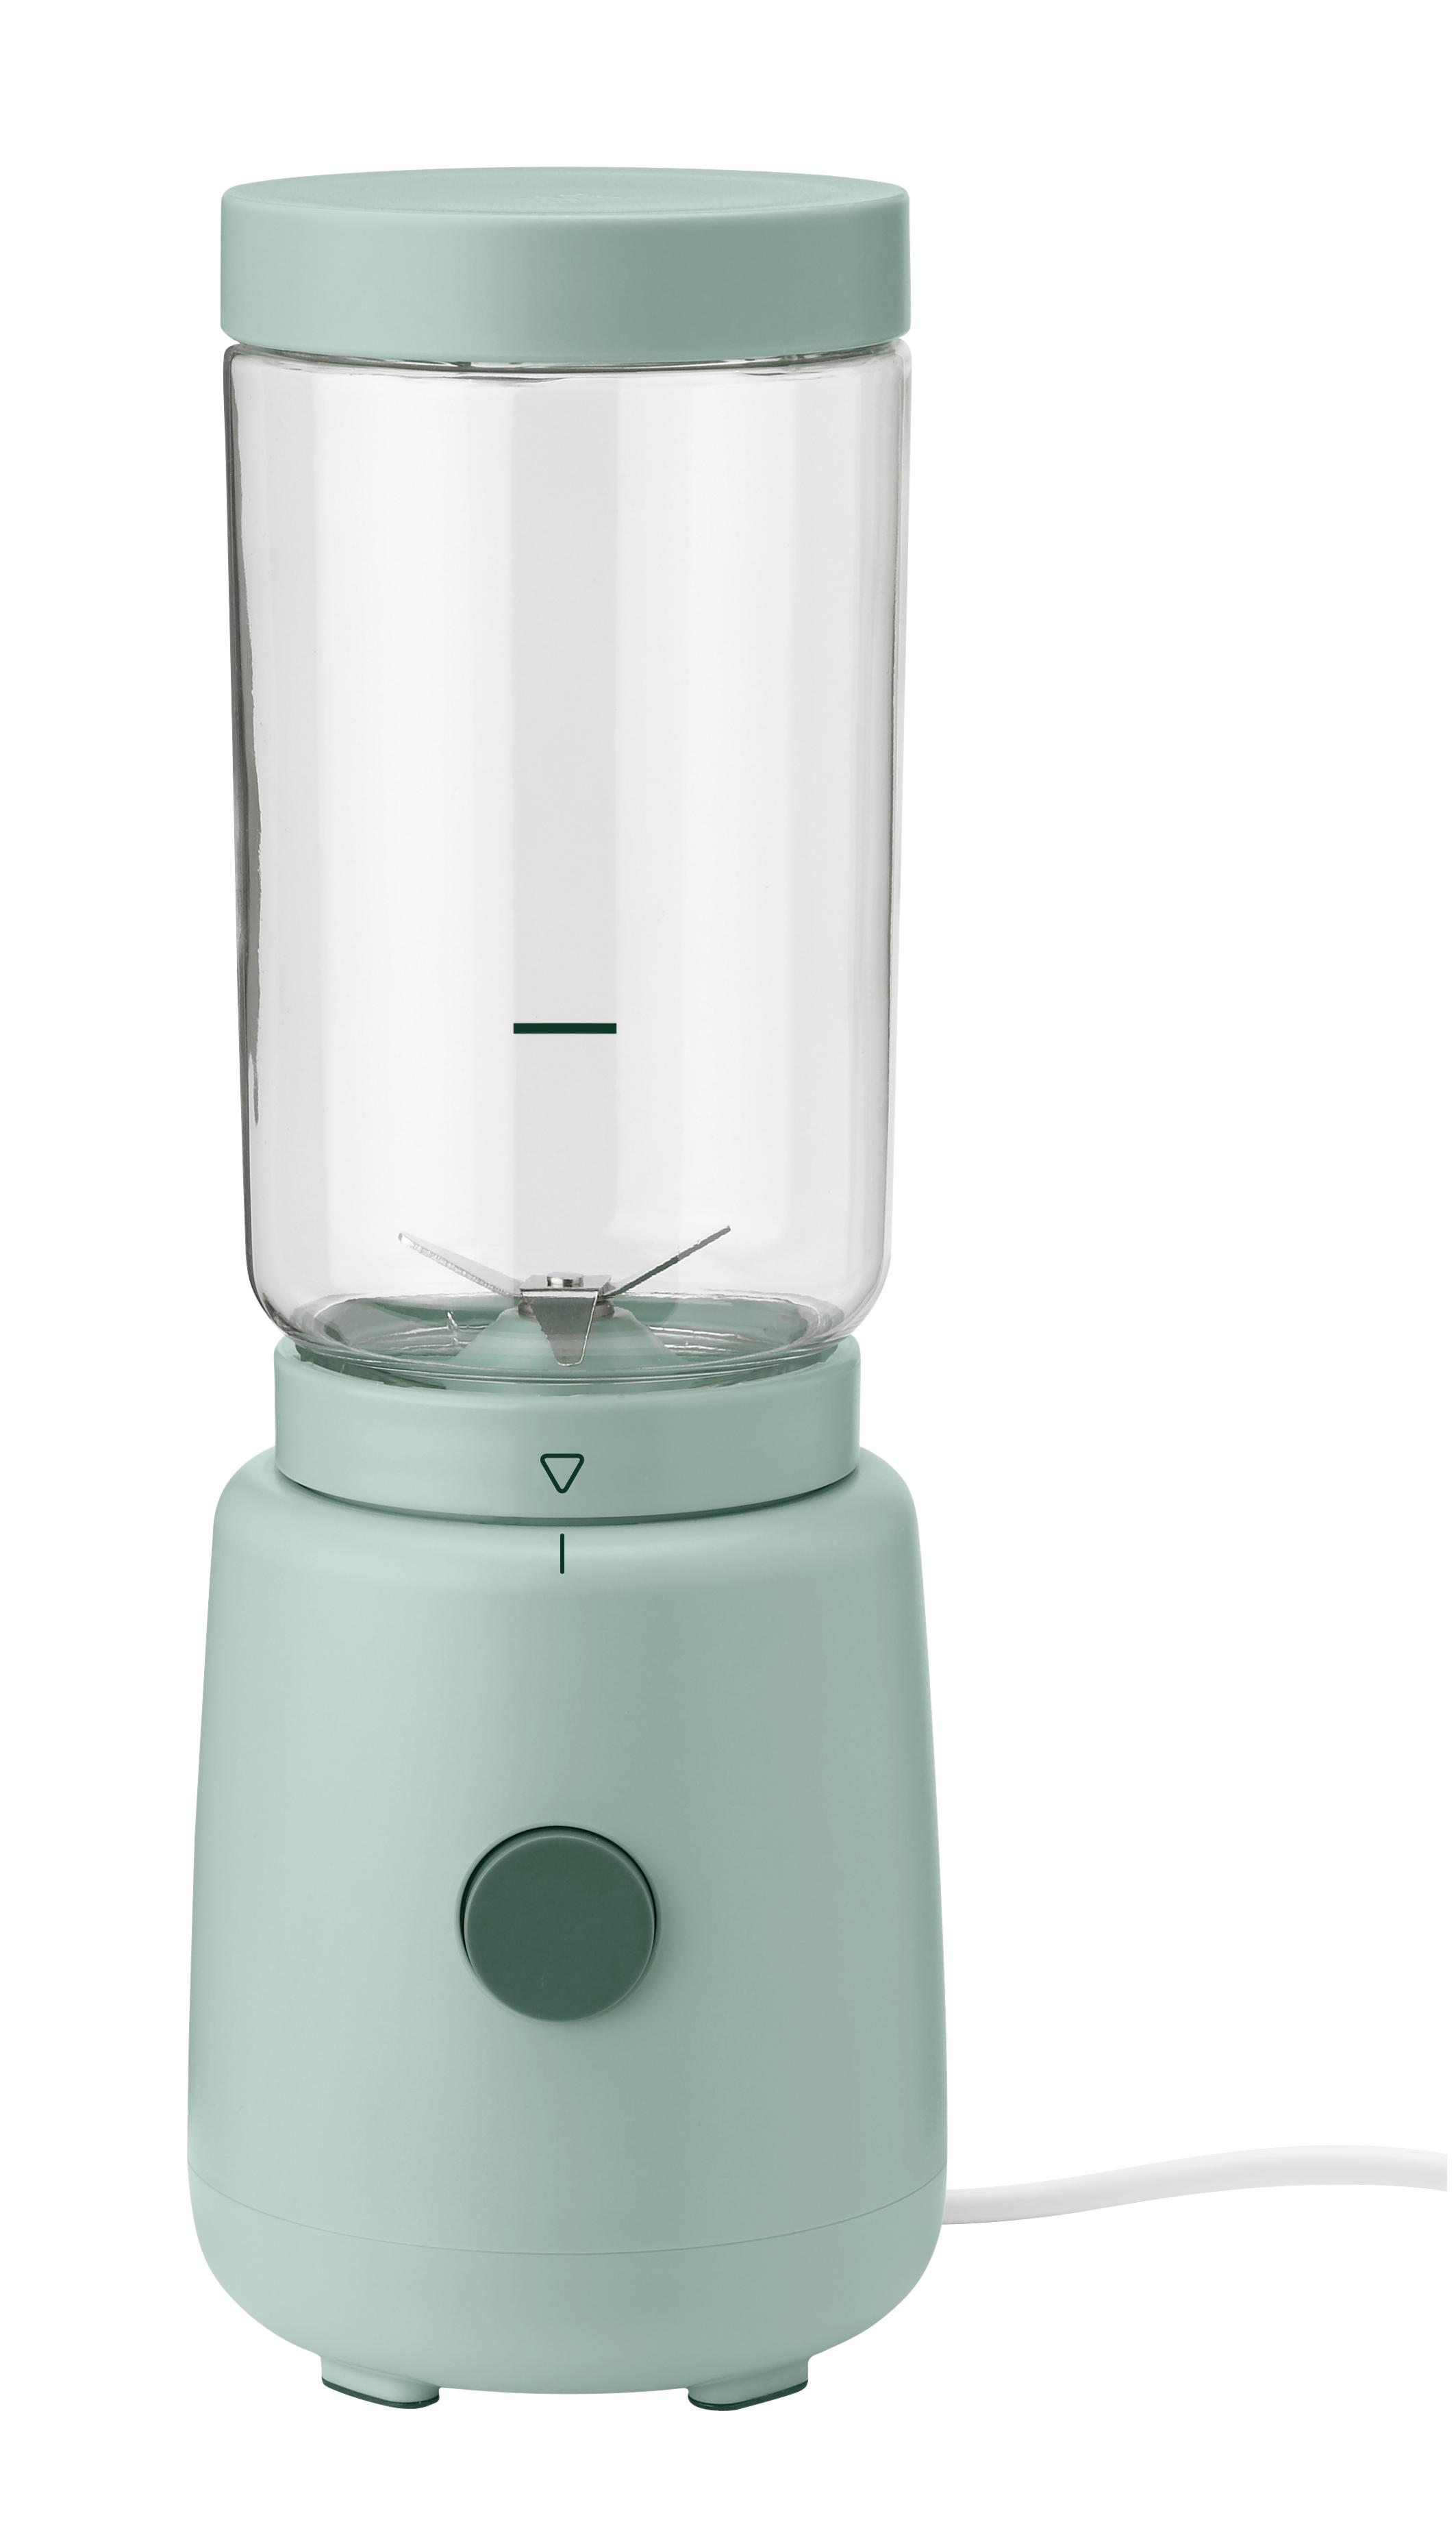 RIG-TIG Foodie smoothieblender, 0,5 l, light green